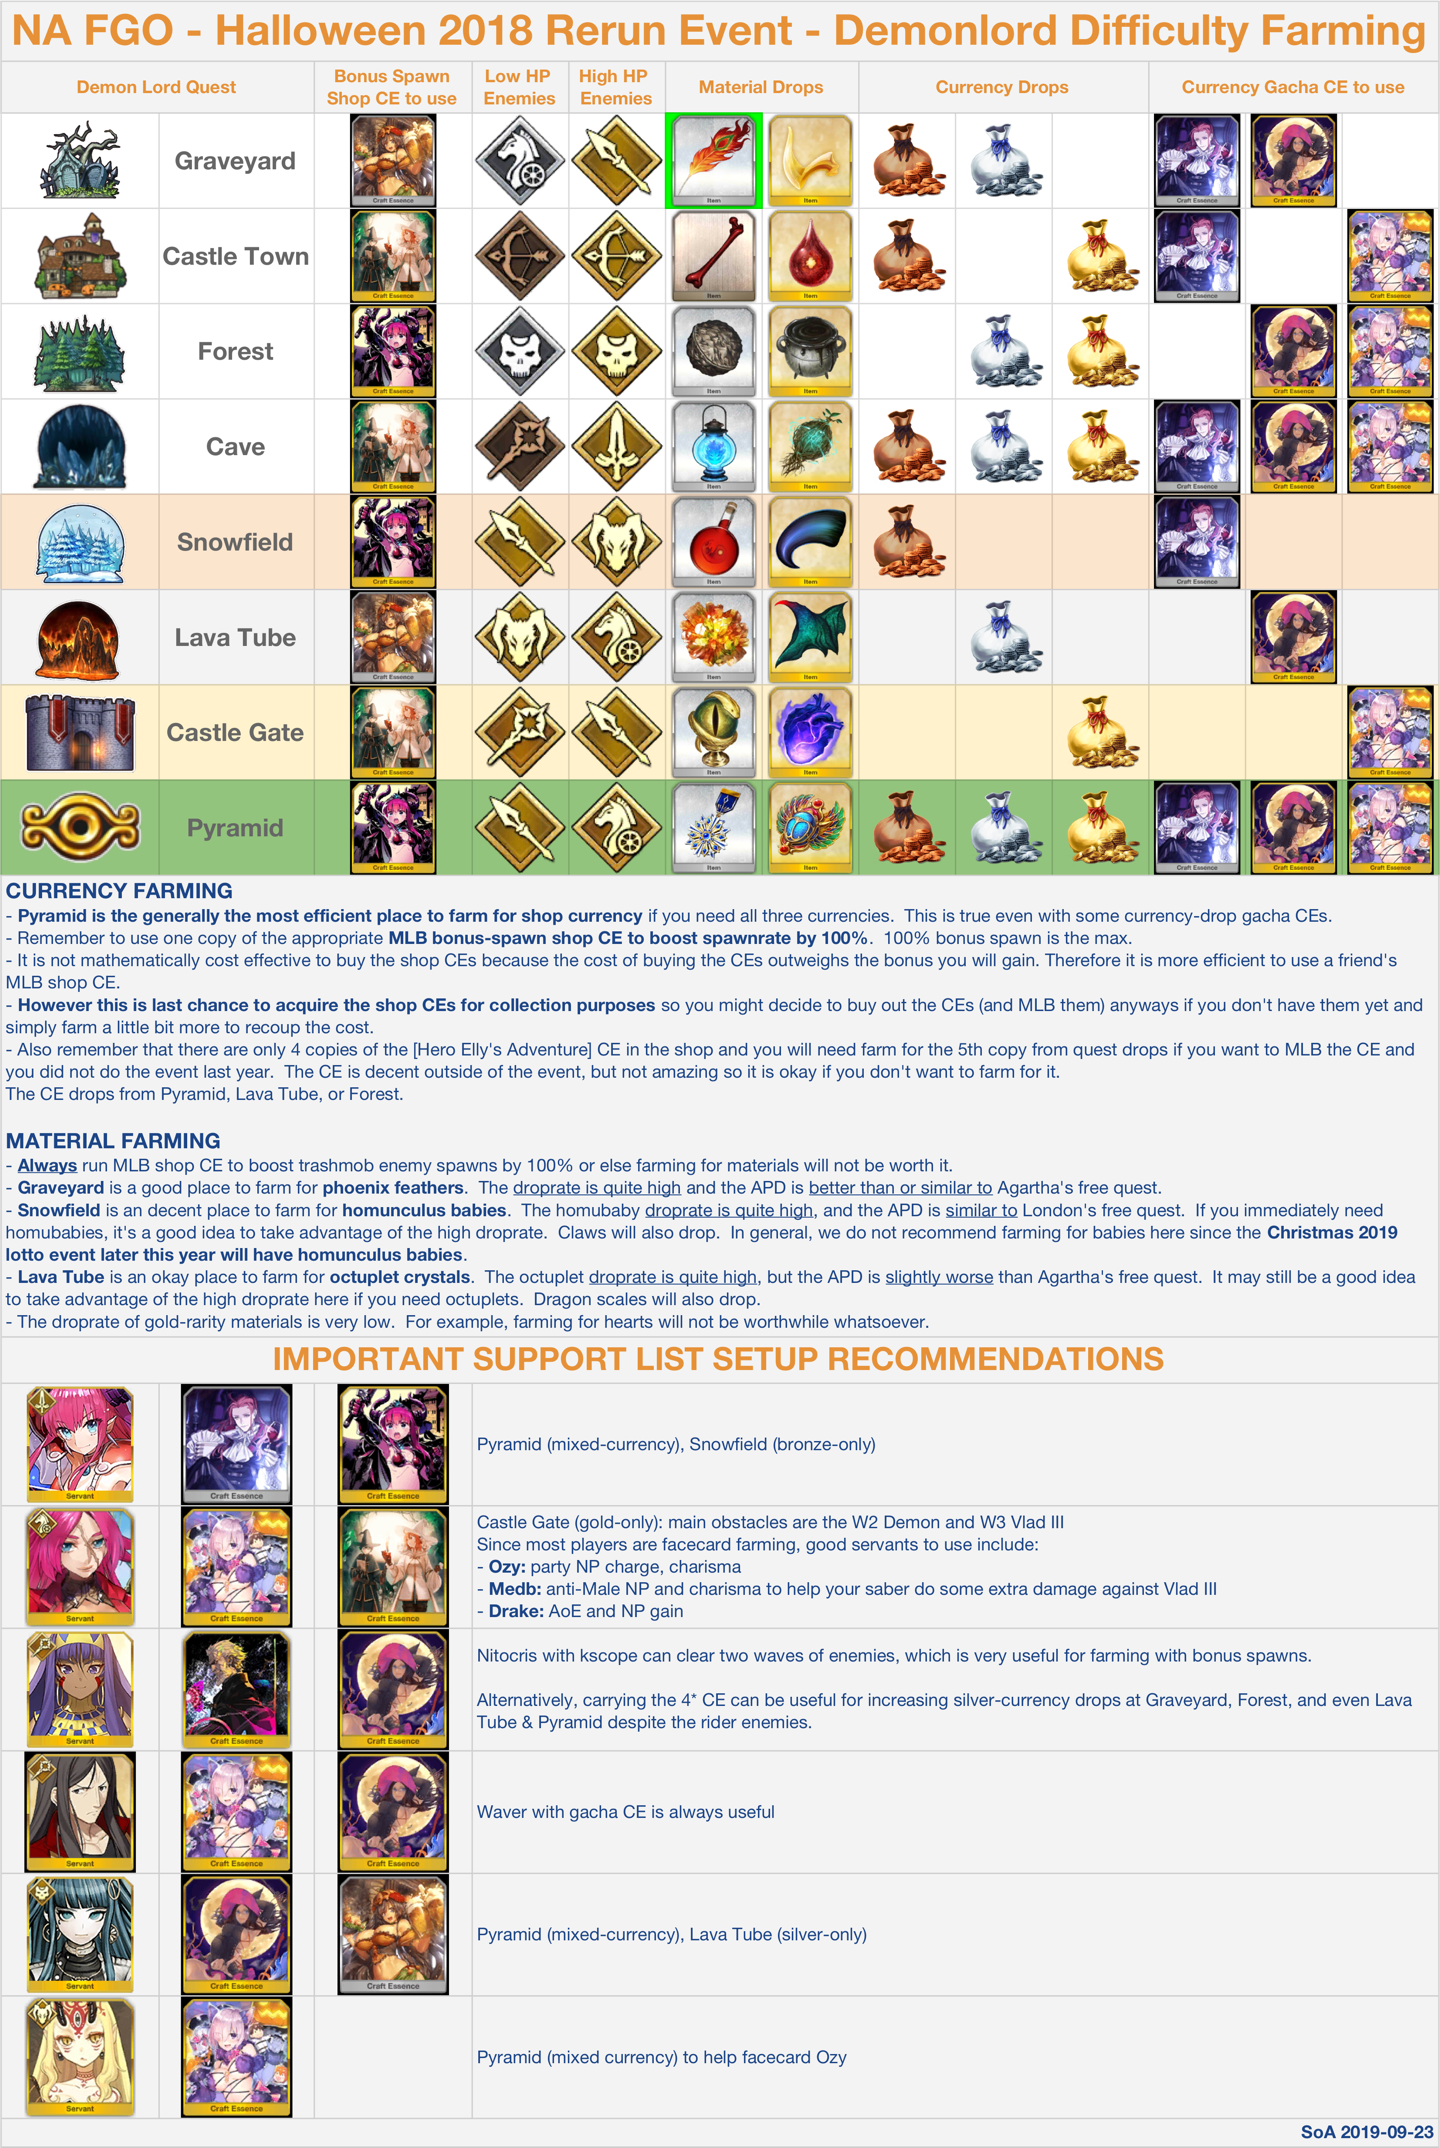 Fgo Christmas 2020 Farming SoA Hinagiku's Fate Grand Order Blog